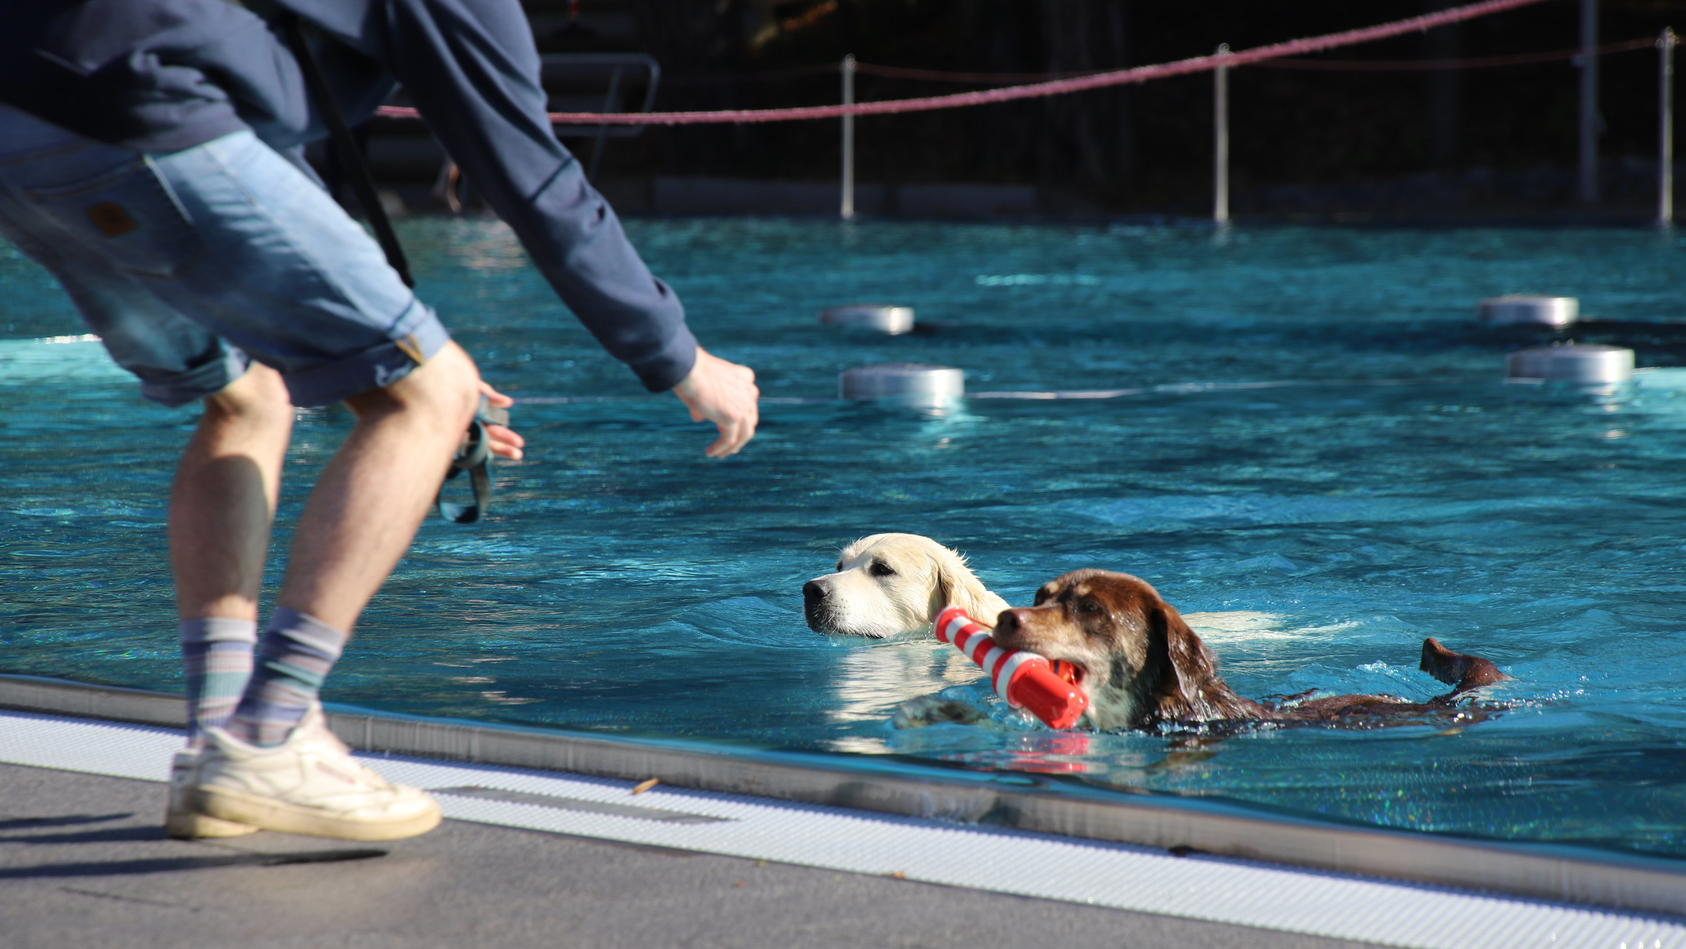 700 Hunde baden in Kölner Freibad zum Saisonende